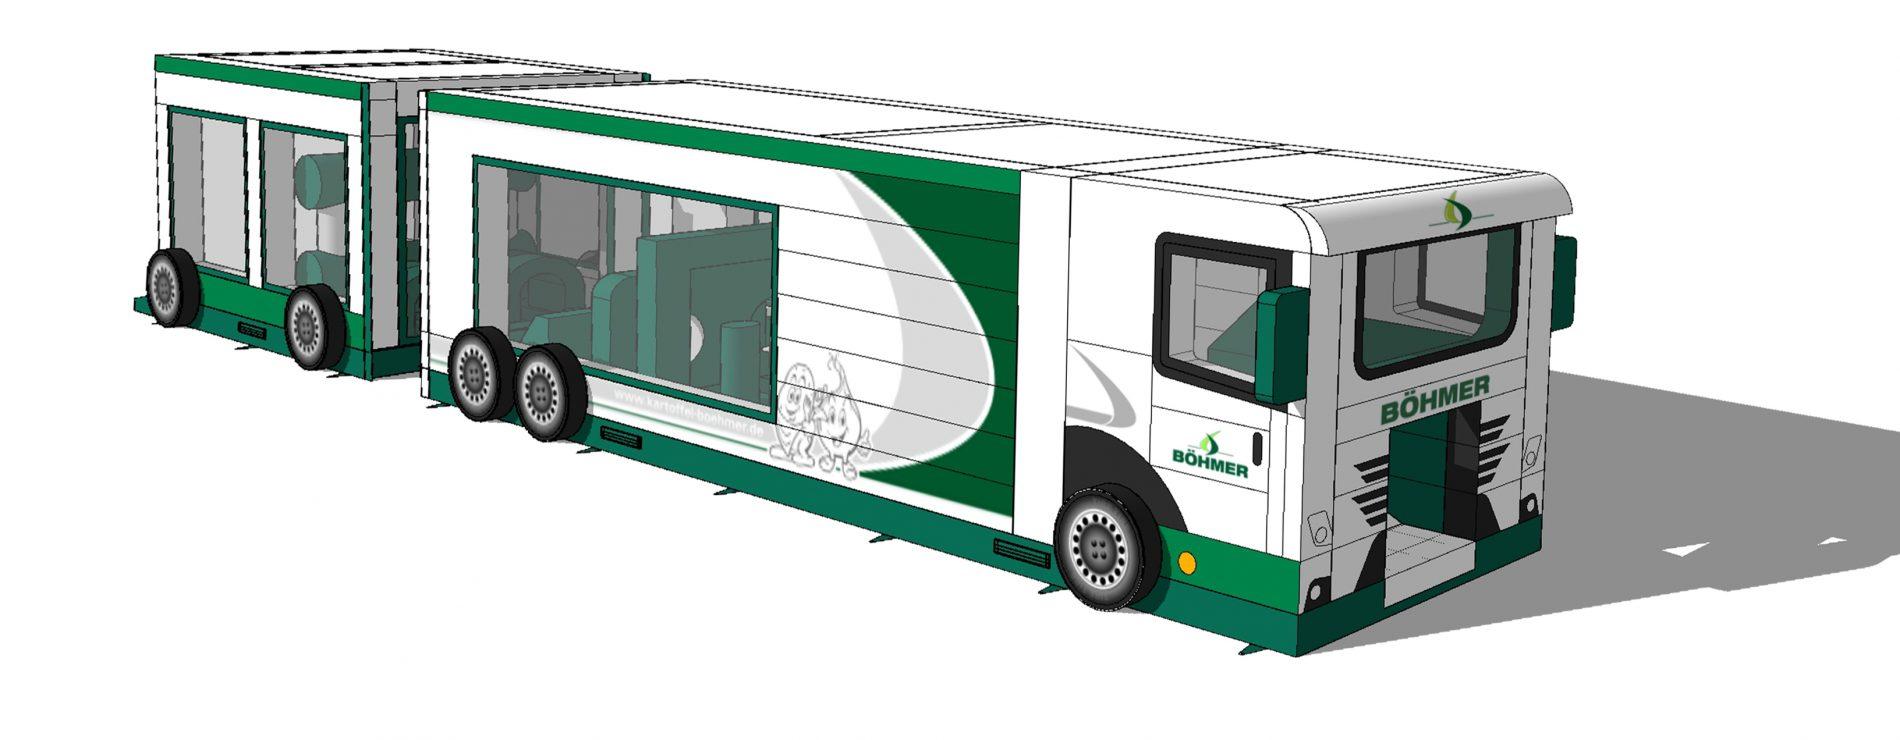 Truck Entwurf Böhmer